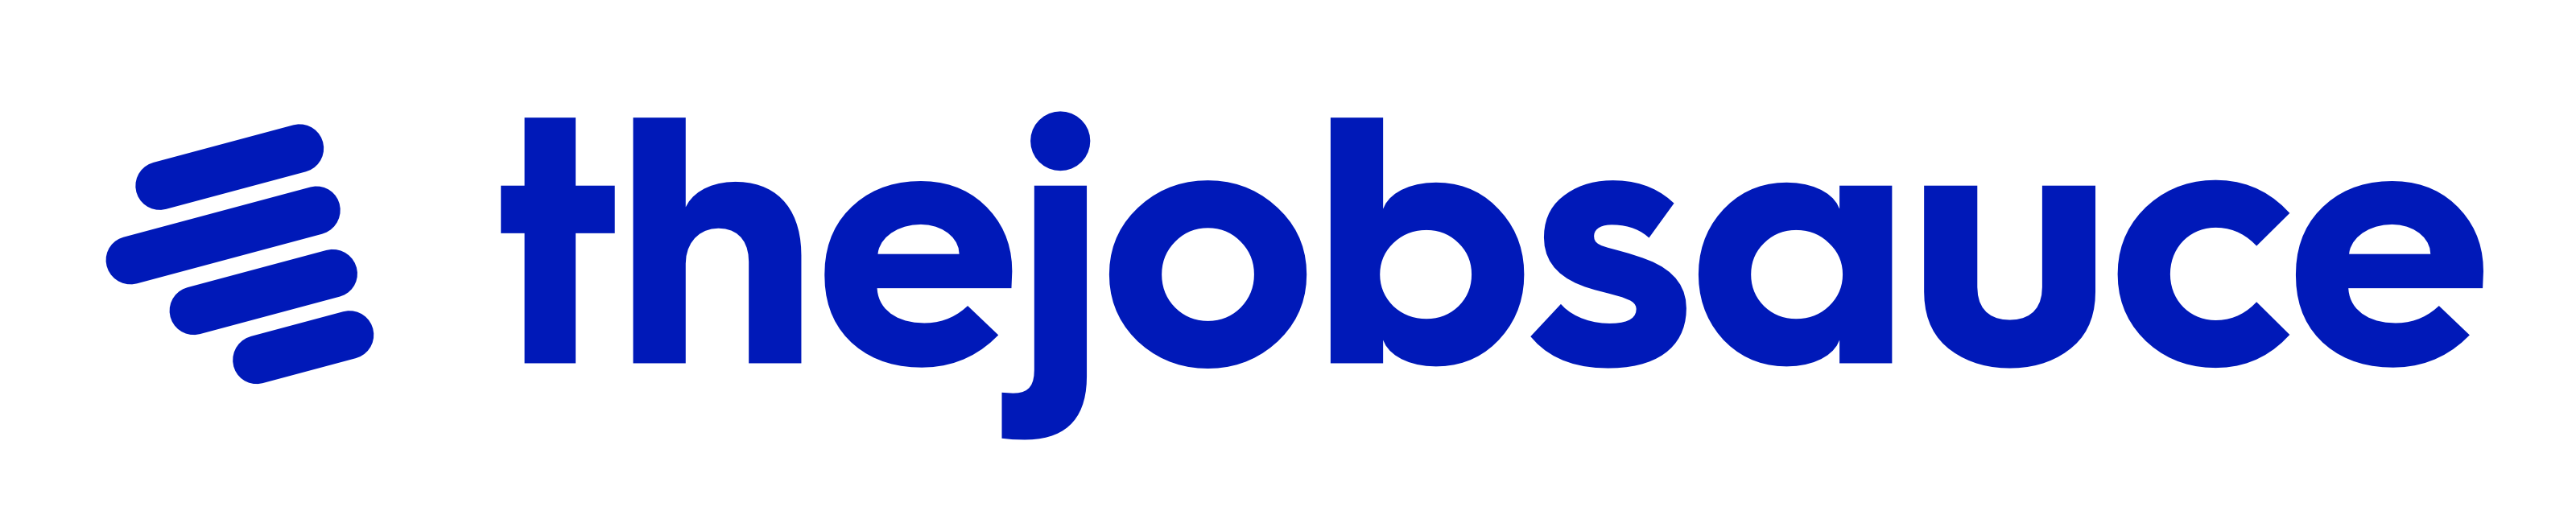 thejobsauce-logo-2